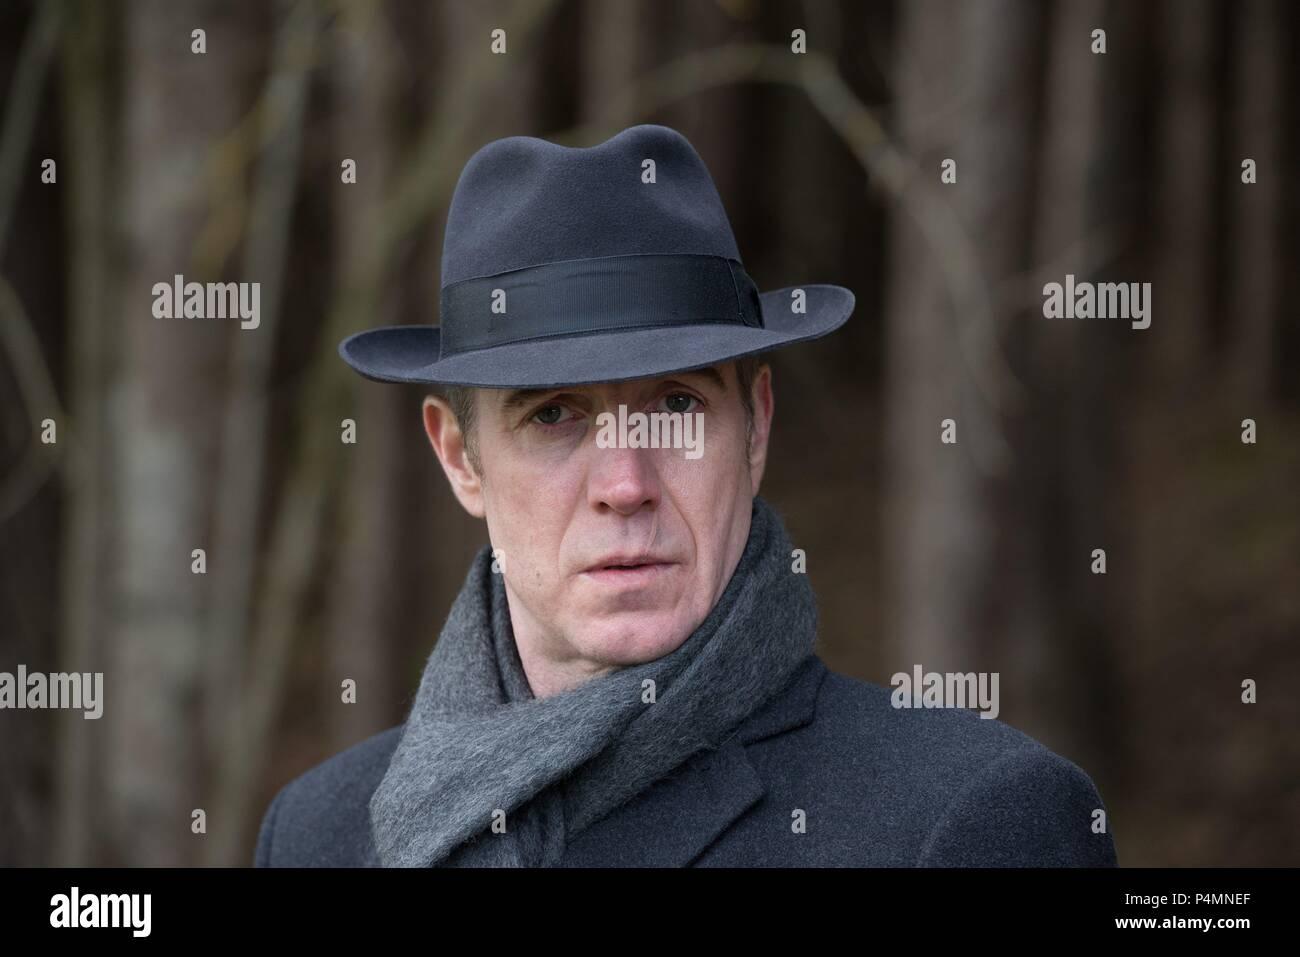 Original Film Title: SNOWDEN.  English Title: SNOWDEN.  Film Director: OLIVER STONE.  Year: 2016.  Stars: RHYS IFANS. Credit: ENDGAME ENTERTAINMENT / Album - Stock Image